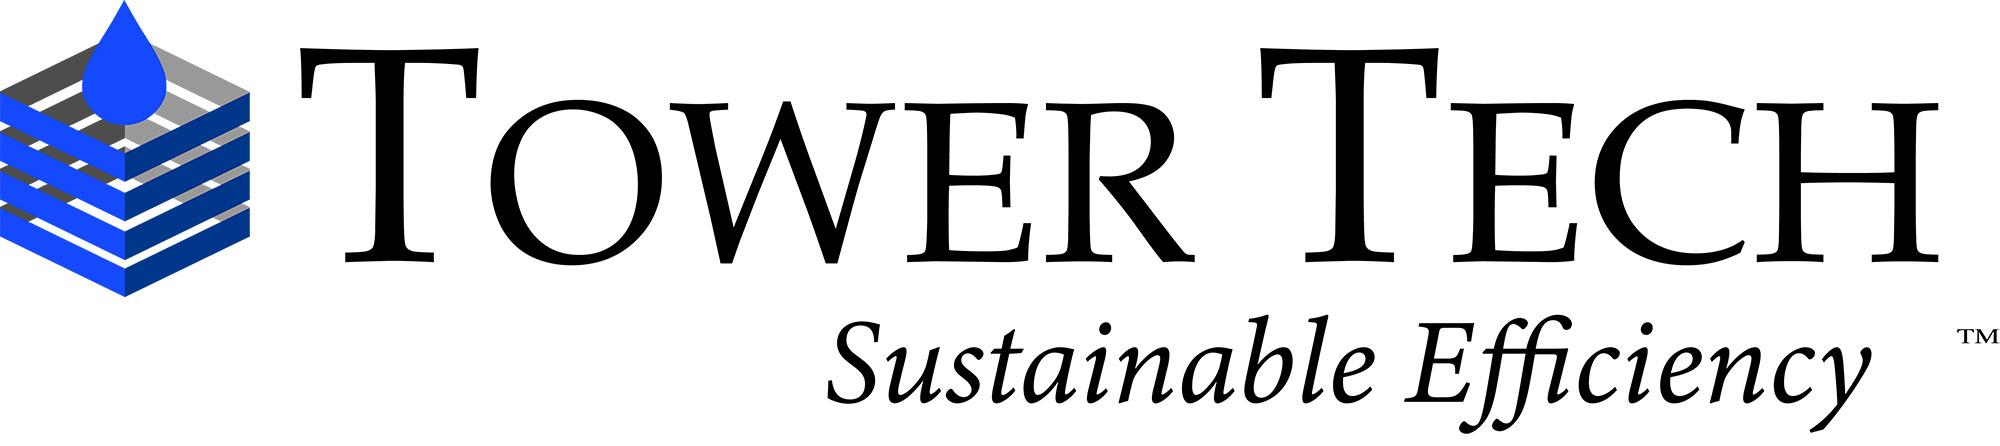 Tower Tech Logo